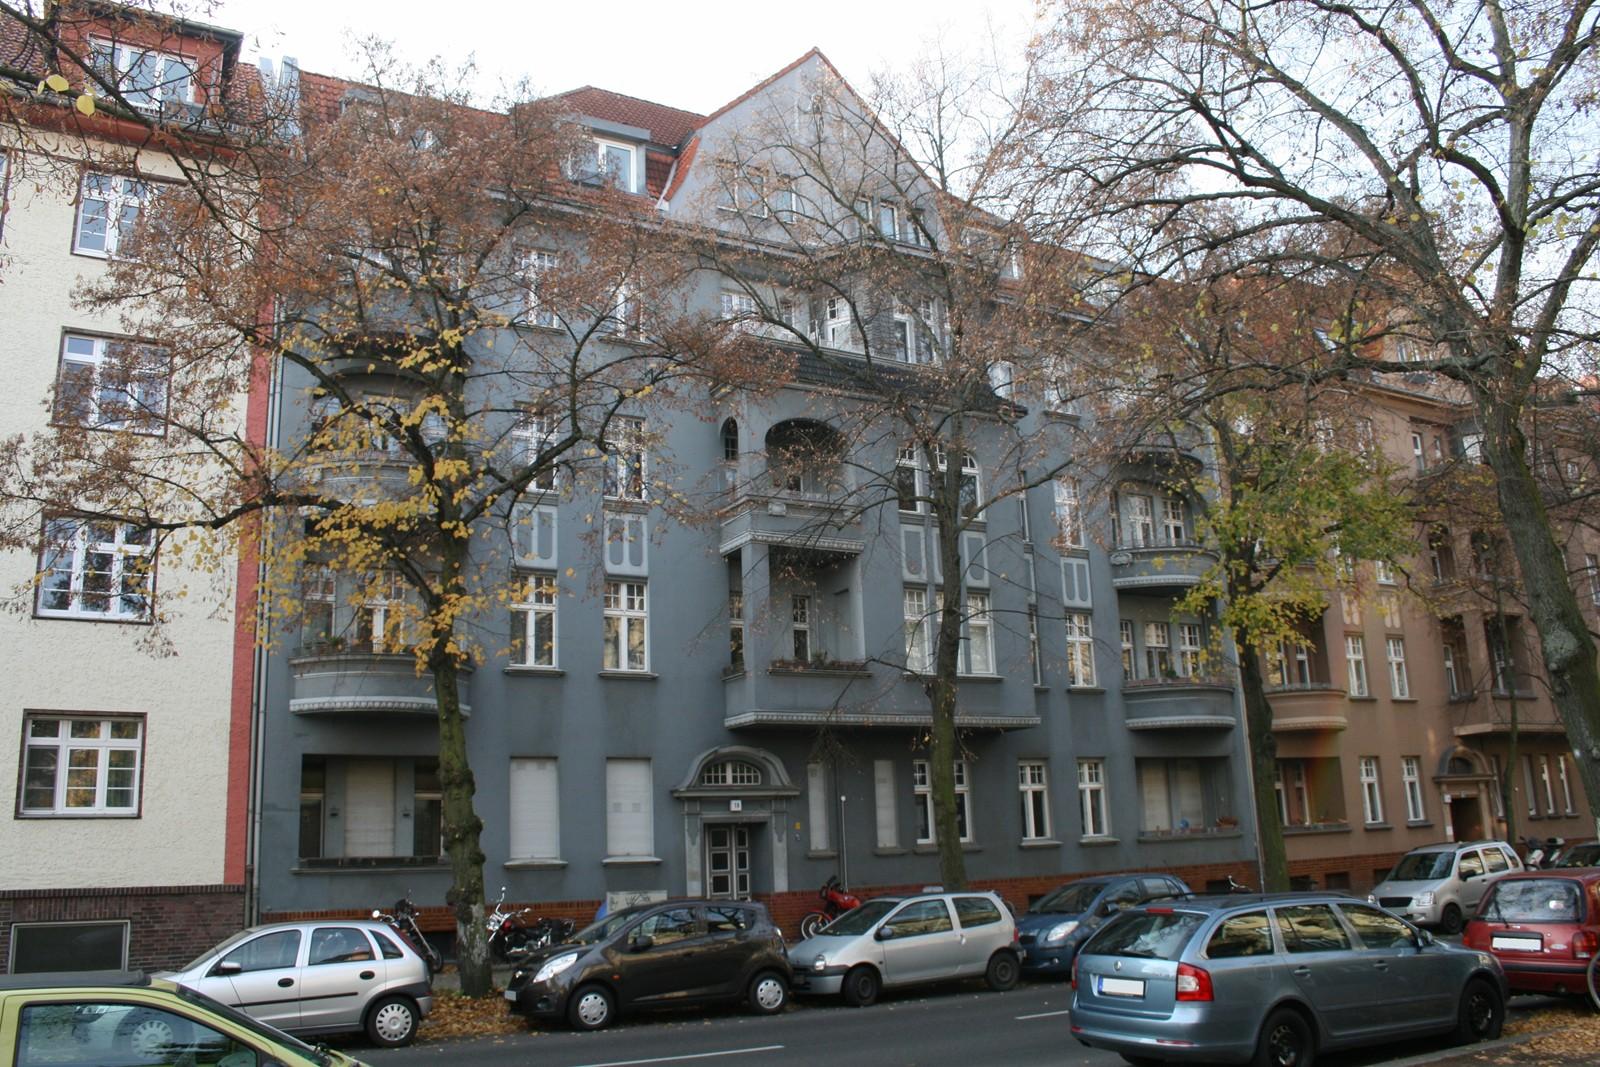 file berlin spandau teltower stra e 18 ldl 09012507 jpg wikimedia commons. Black Bedroom Furniture Sets. Home Design Ideas